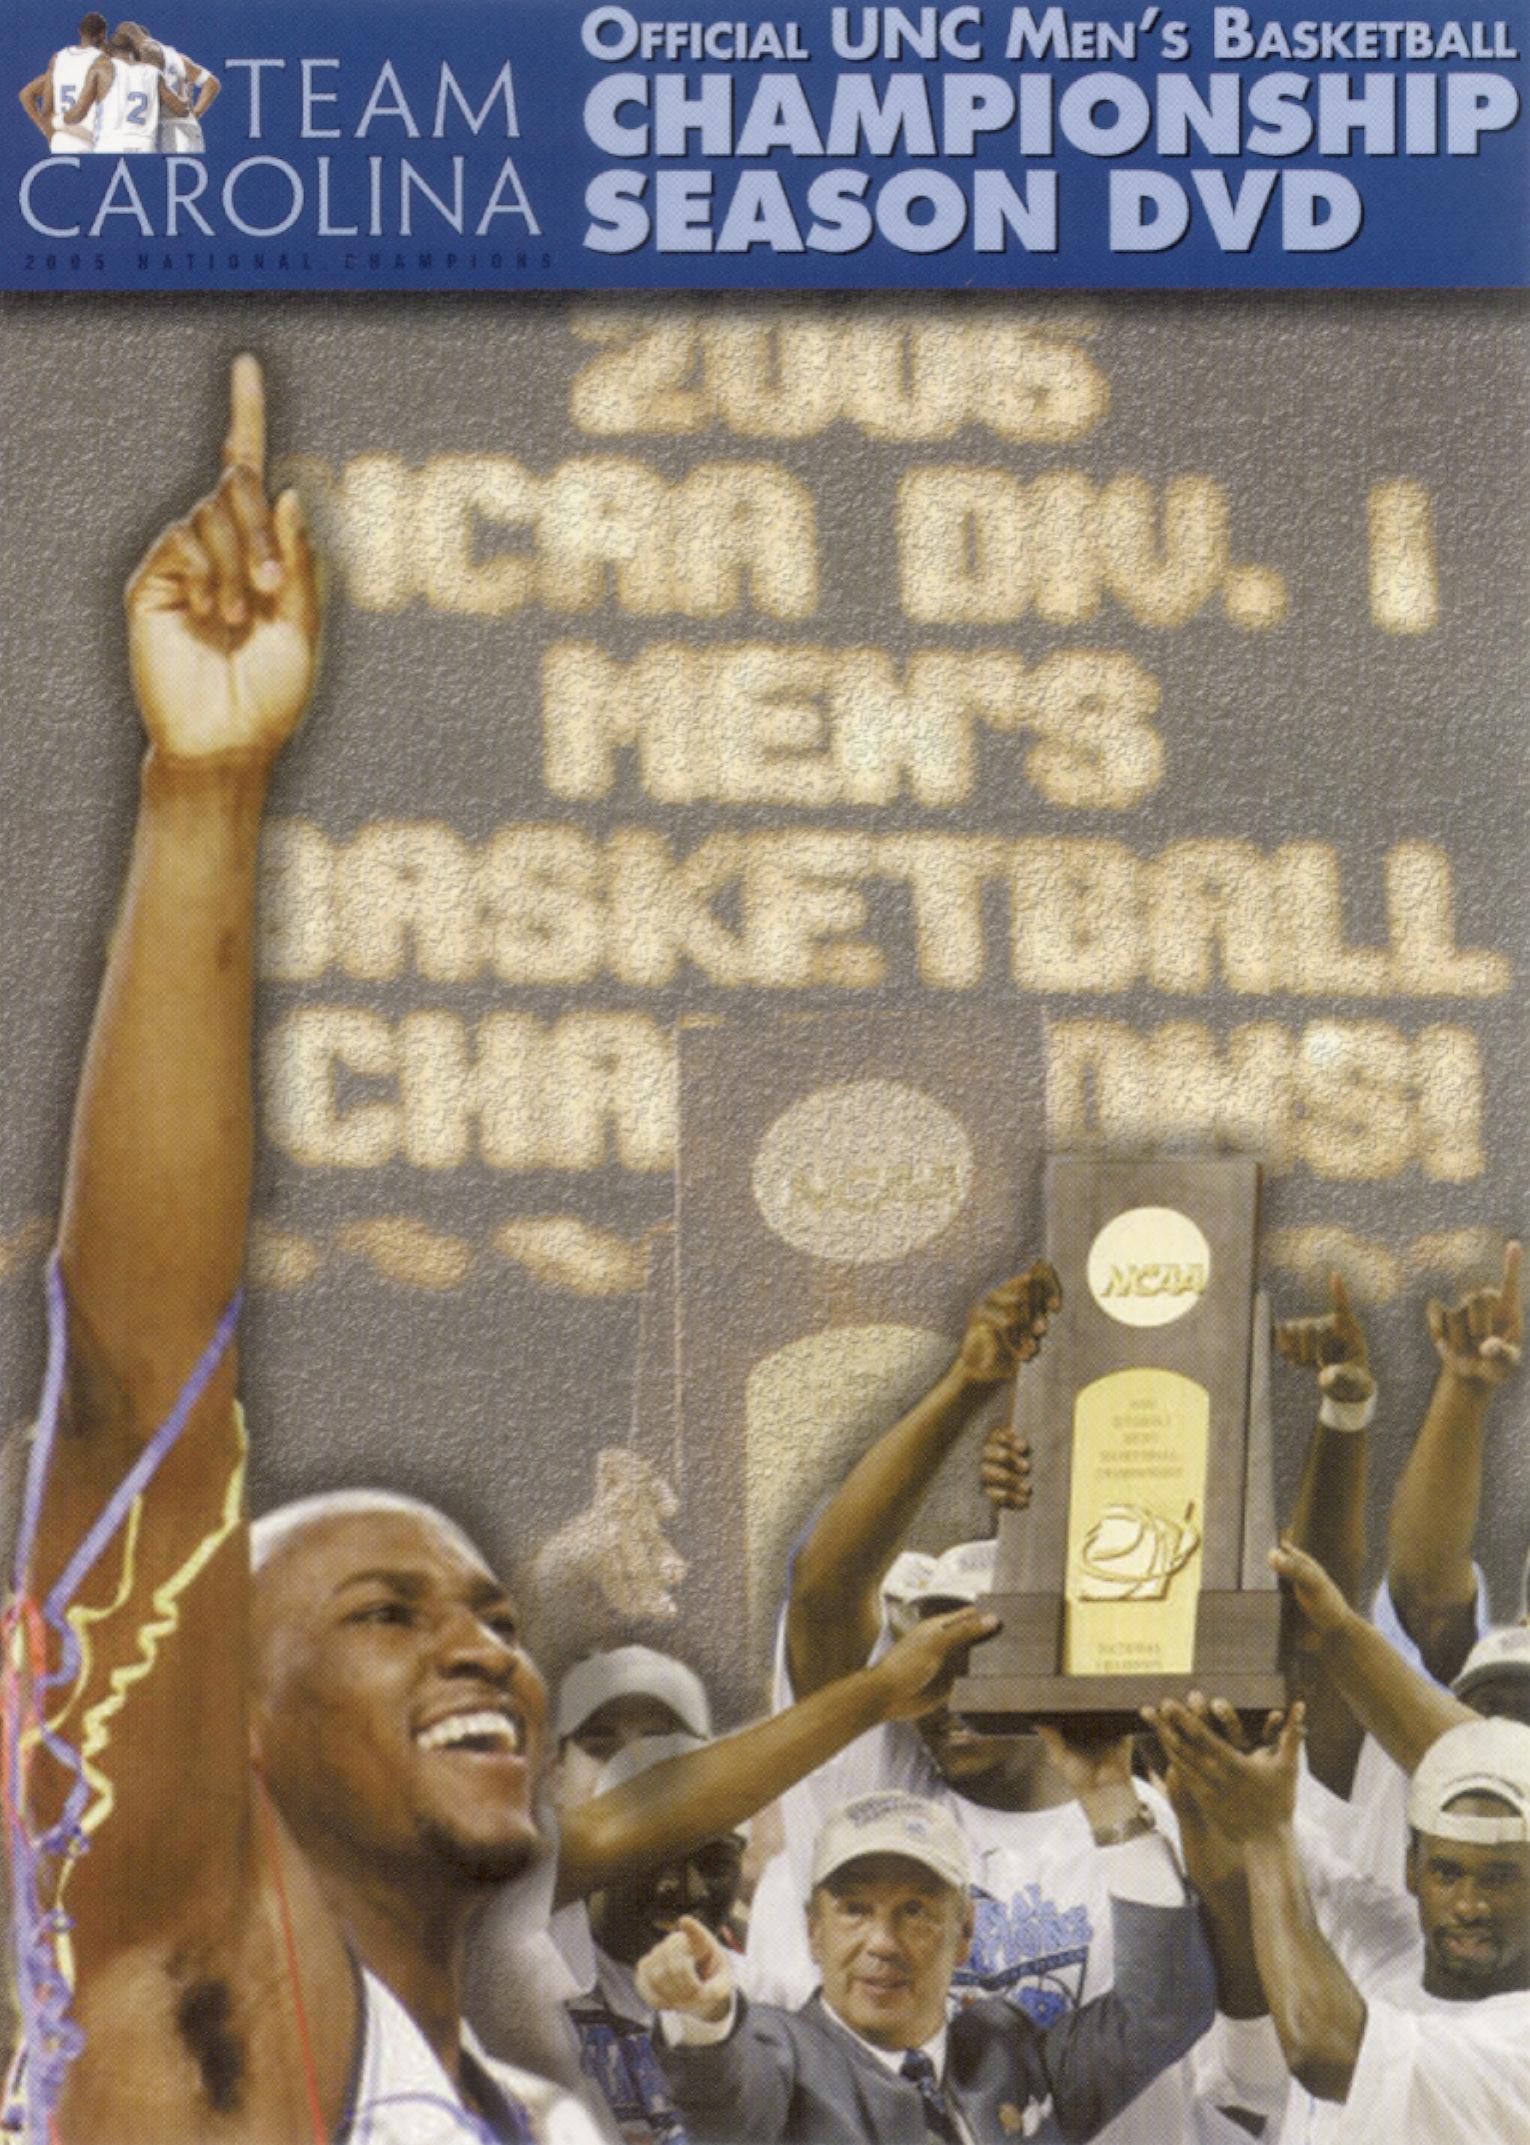 Team Carolina: 2004-2005 Official UNC Men's Basketball, Championship Season